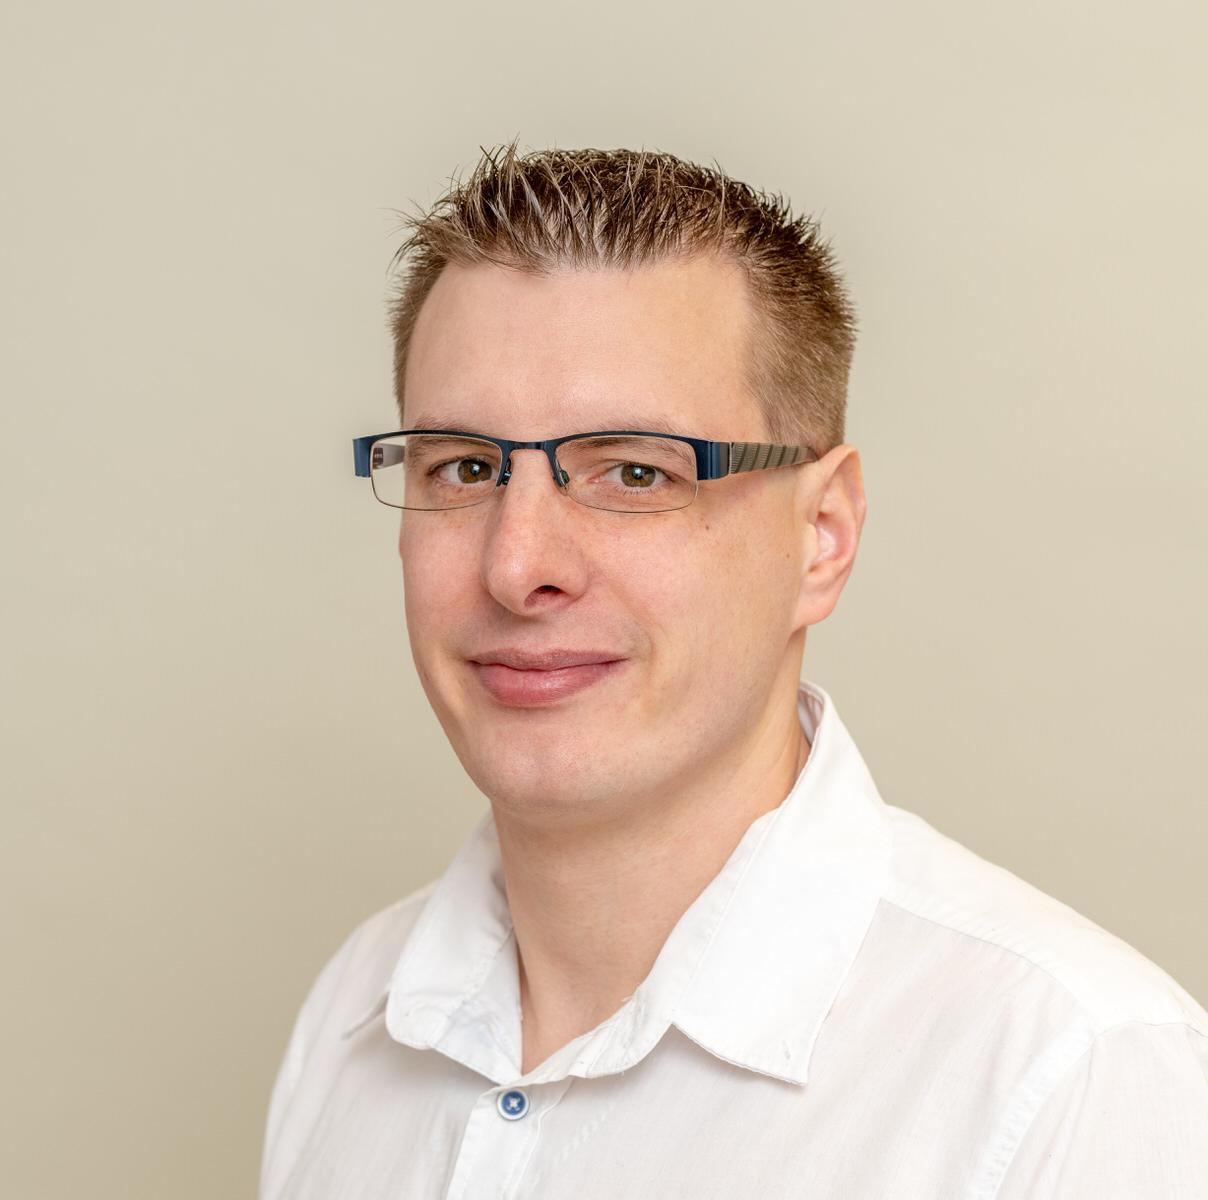 Patrick Gürschke